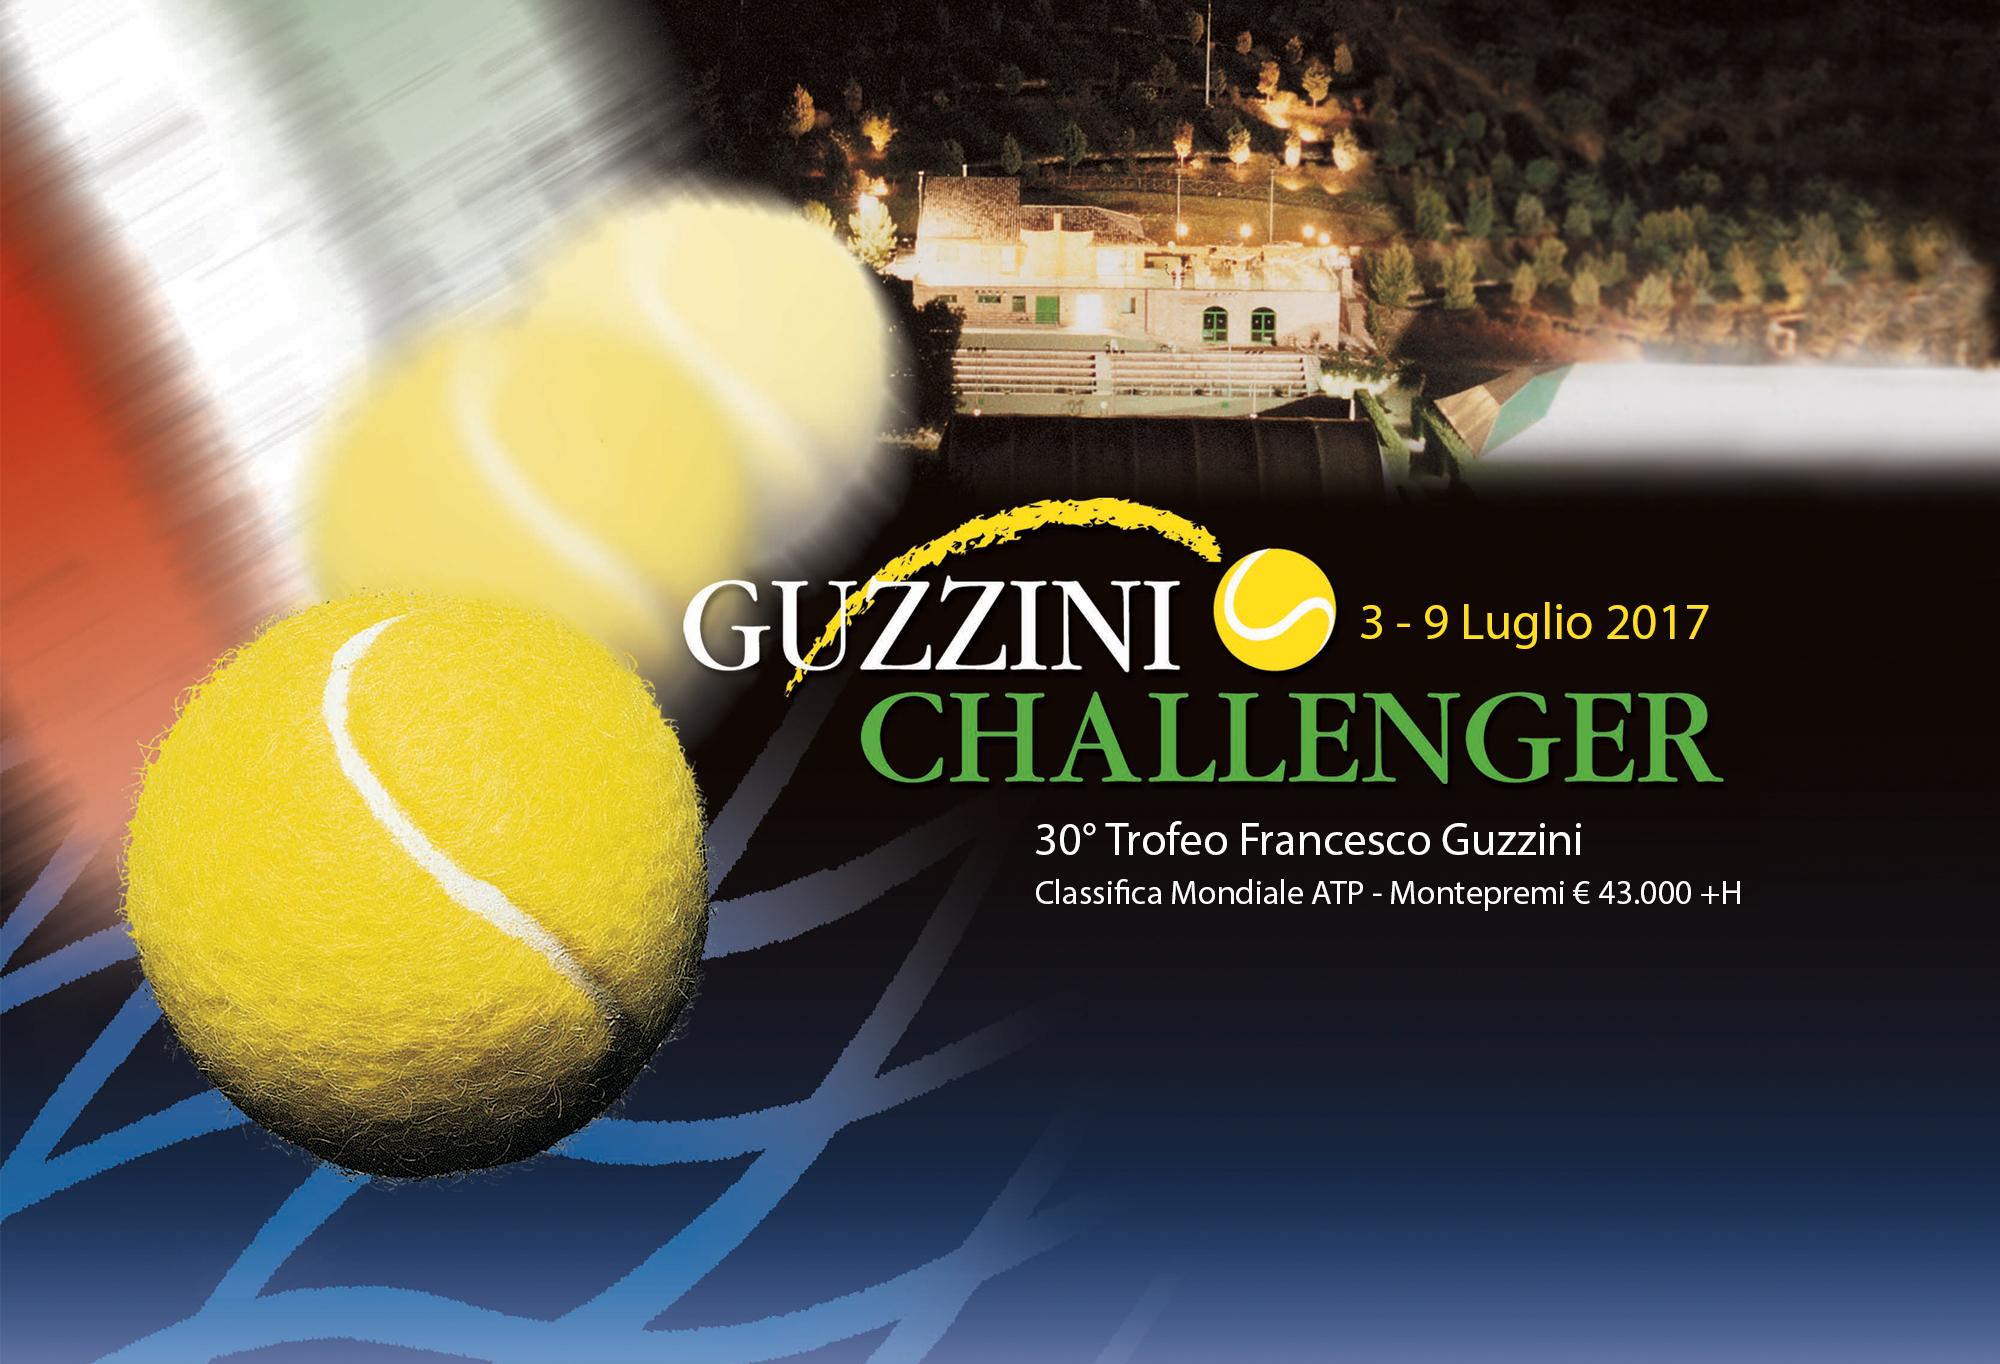 30° Trofeo Francesco Guzzini